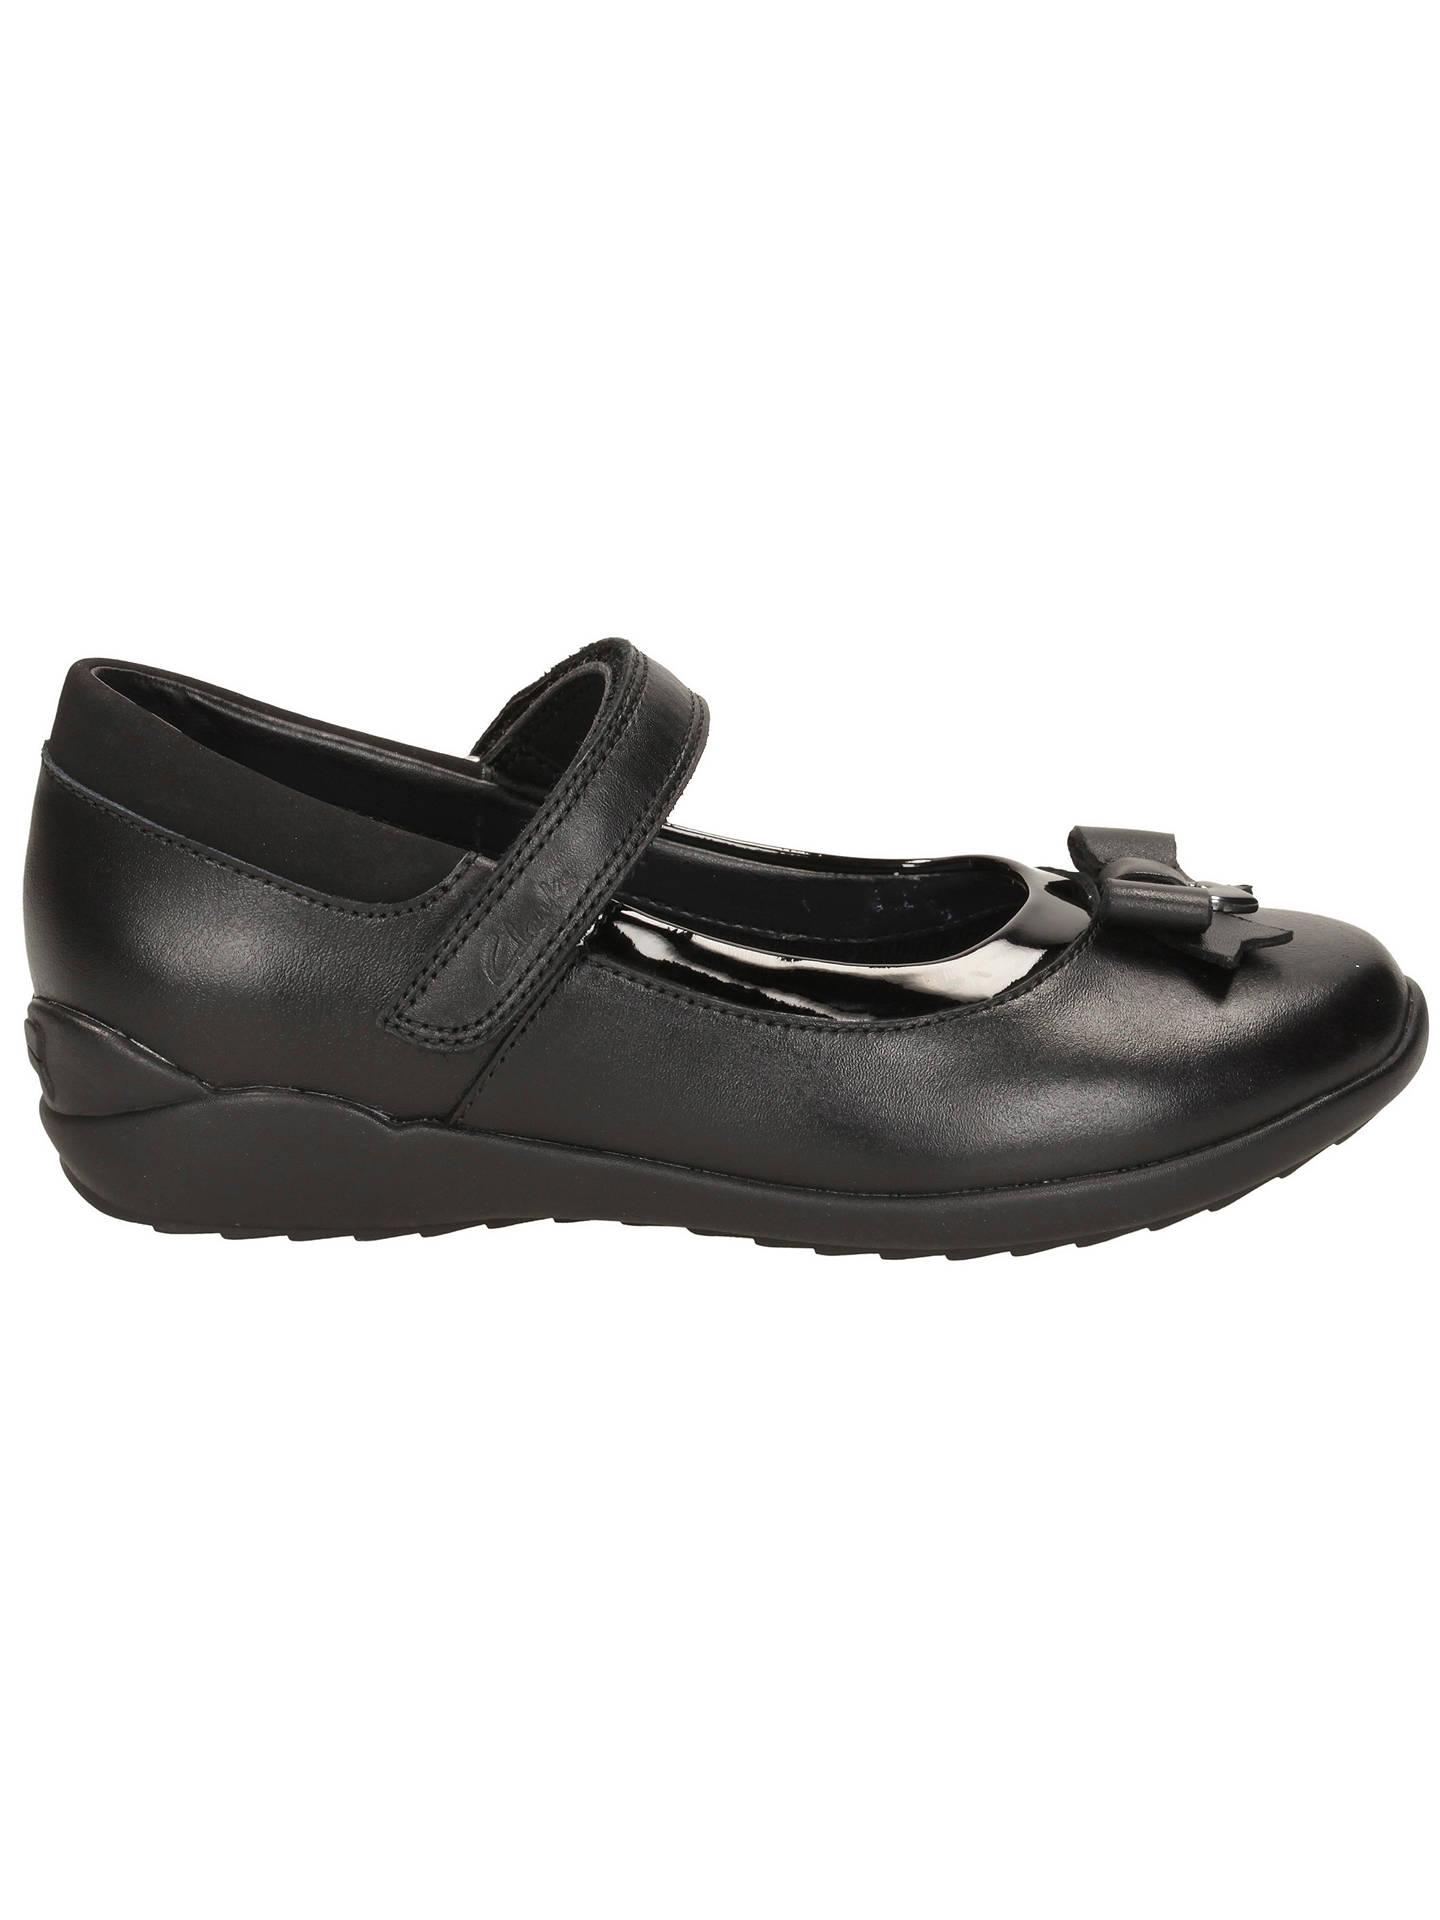 550adf565 ... Buy Clarks Children's Gloform Ting Fever School Shoes, Black, 10E Jnr  Online at johnlewis ...